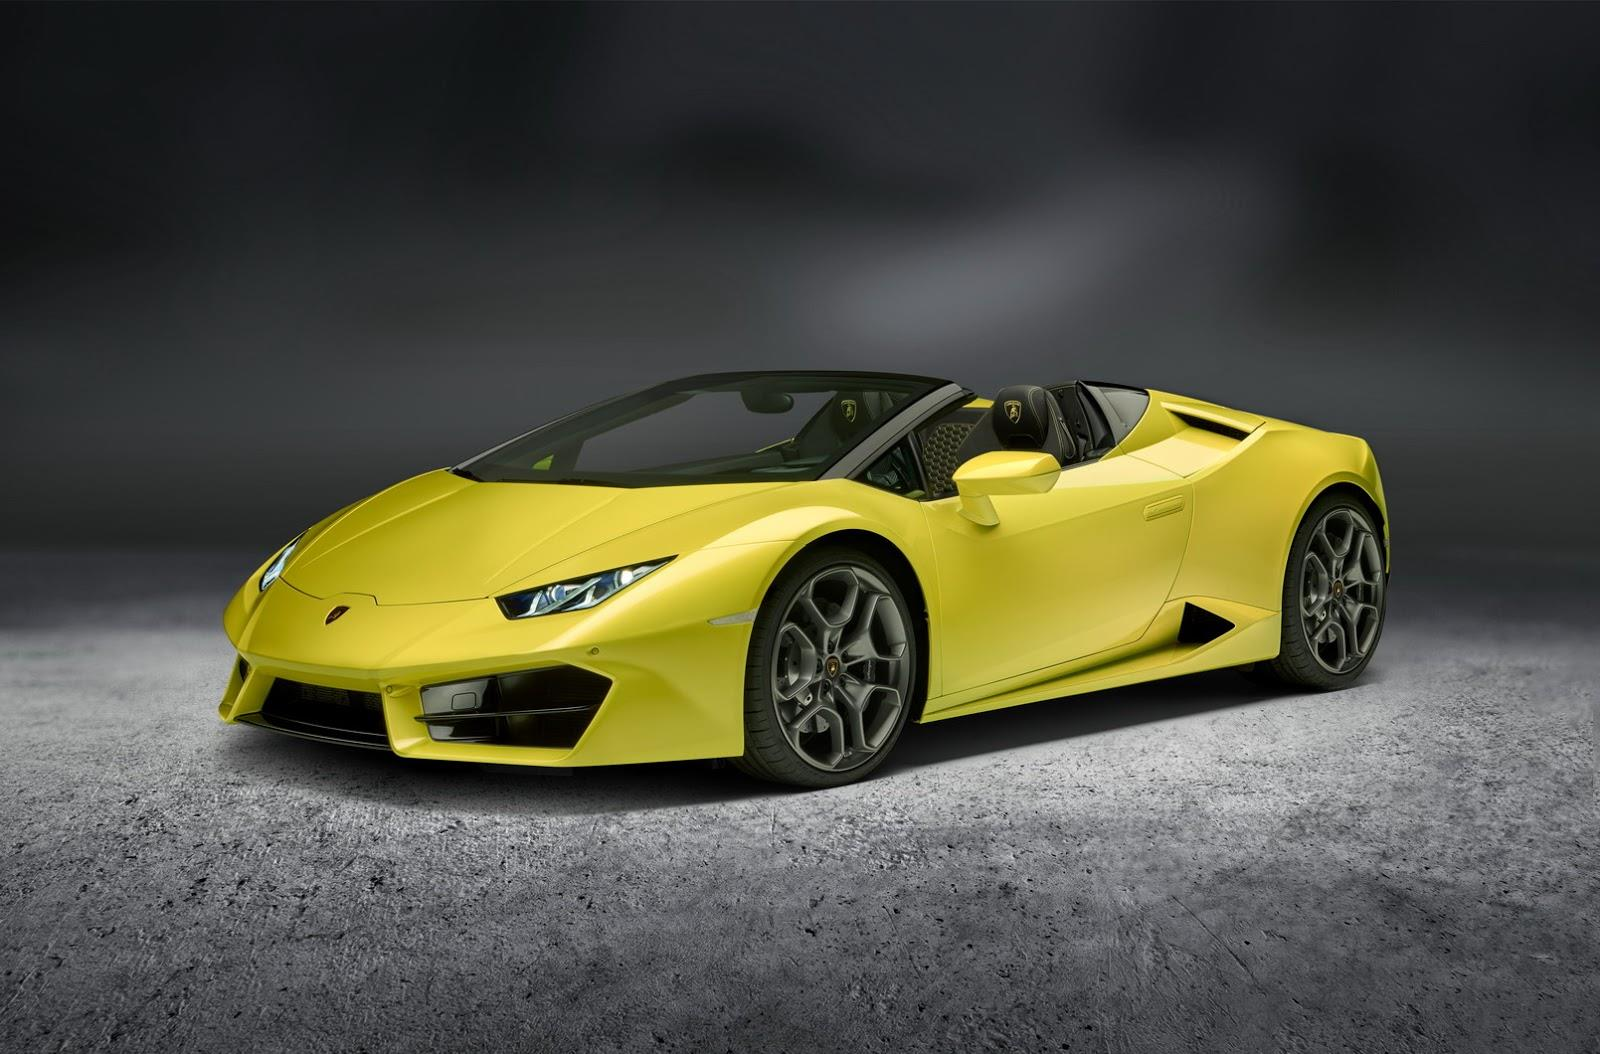 Lamborghini Huracan rear-wheel drive Spyder image gallery